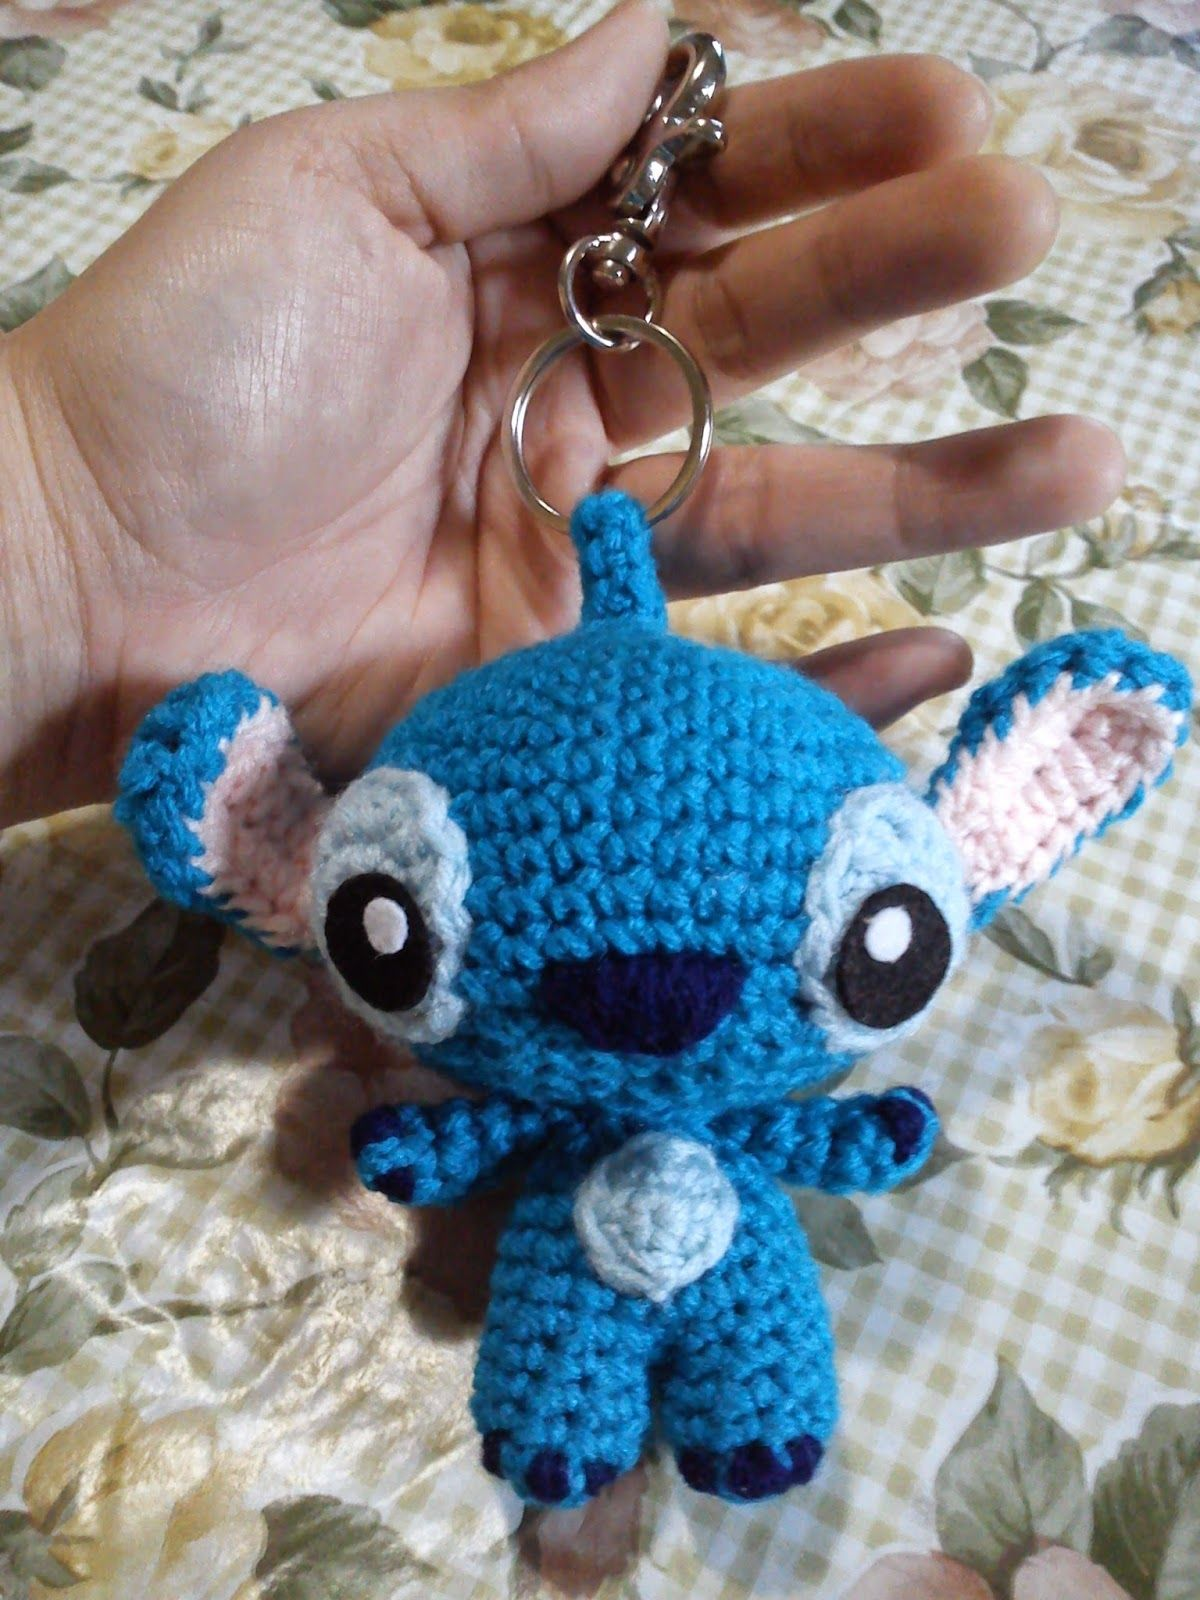 Snorlax Amigurumi Crochet Tutorial Part 1 - YouTube   1600x1200